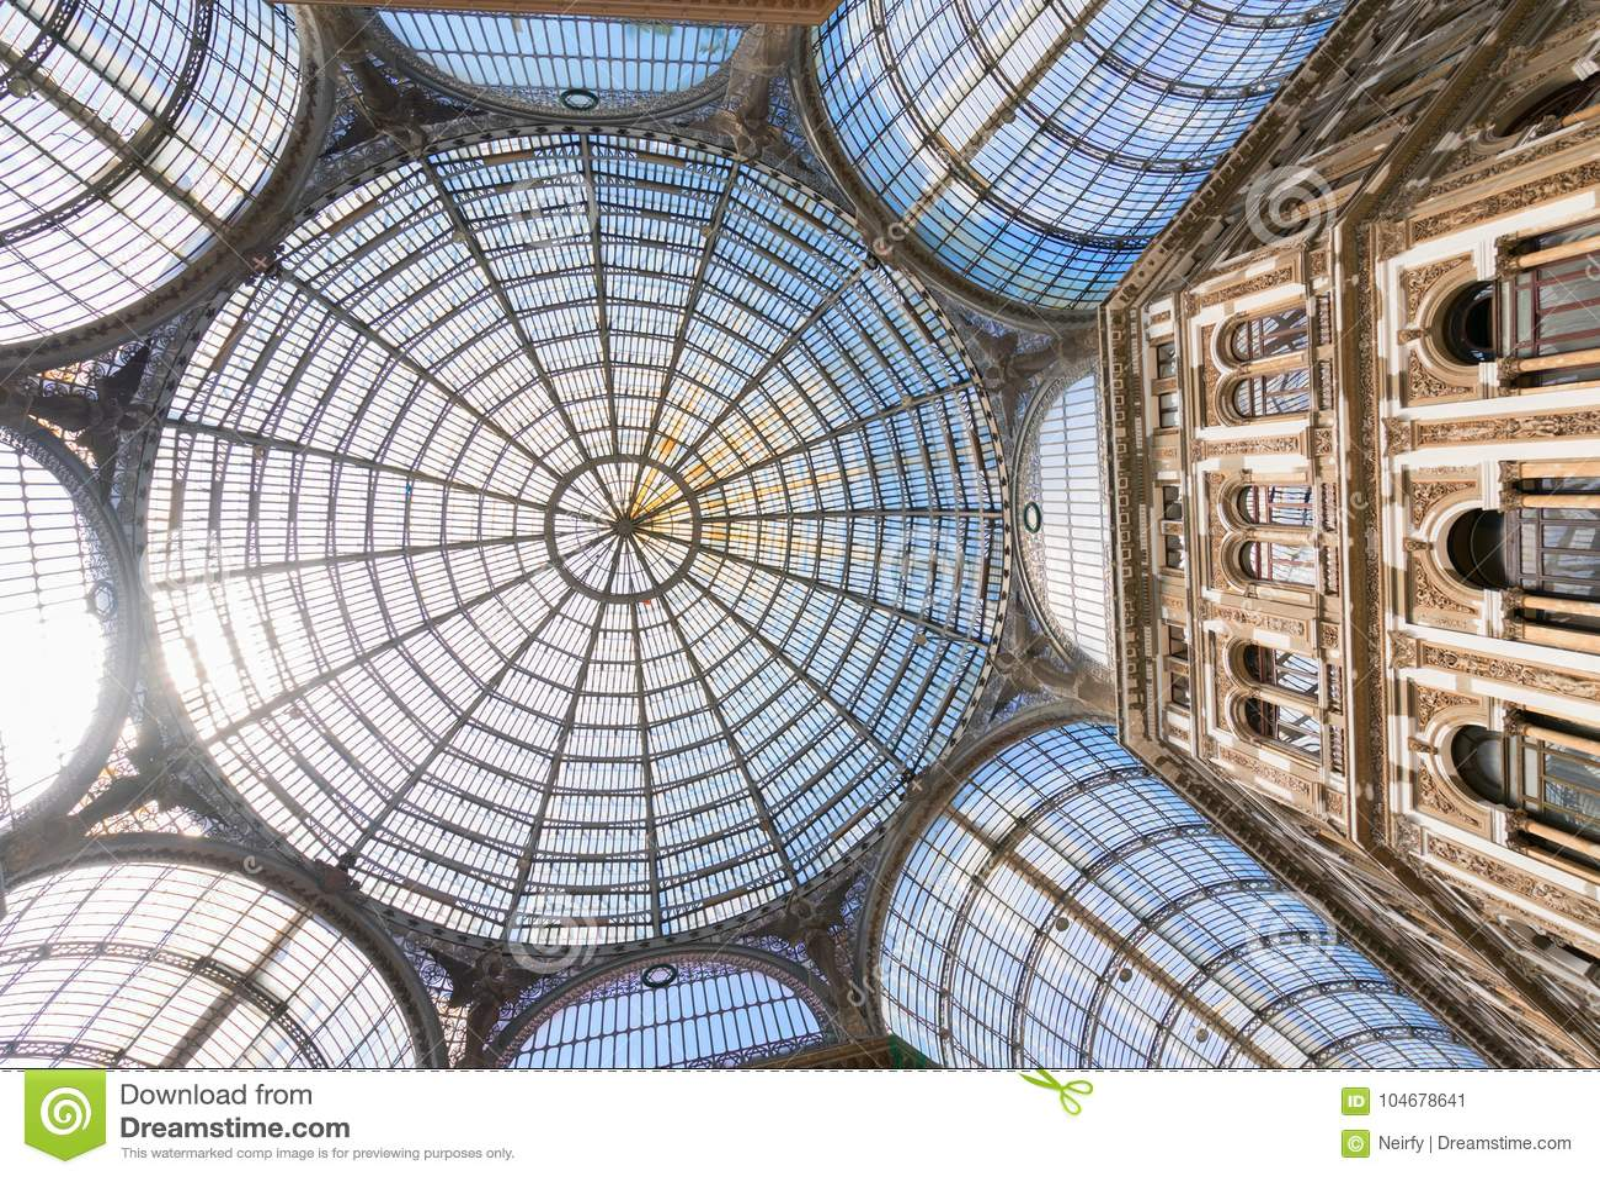 Galleria Umberto I, public shopping gallery in Naples.